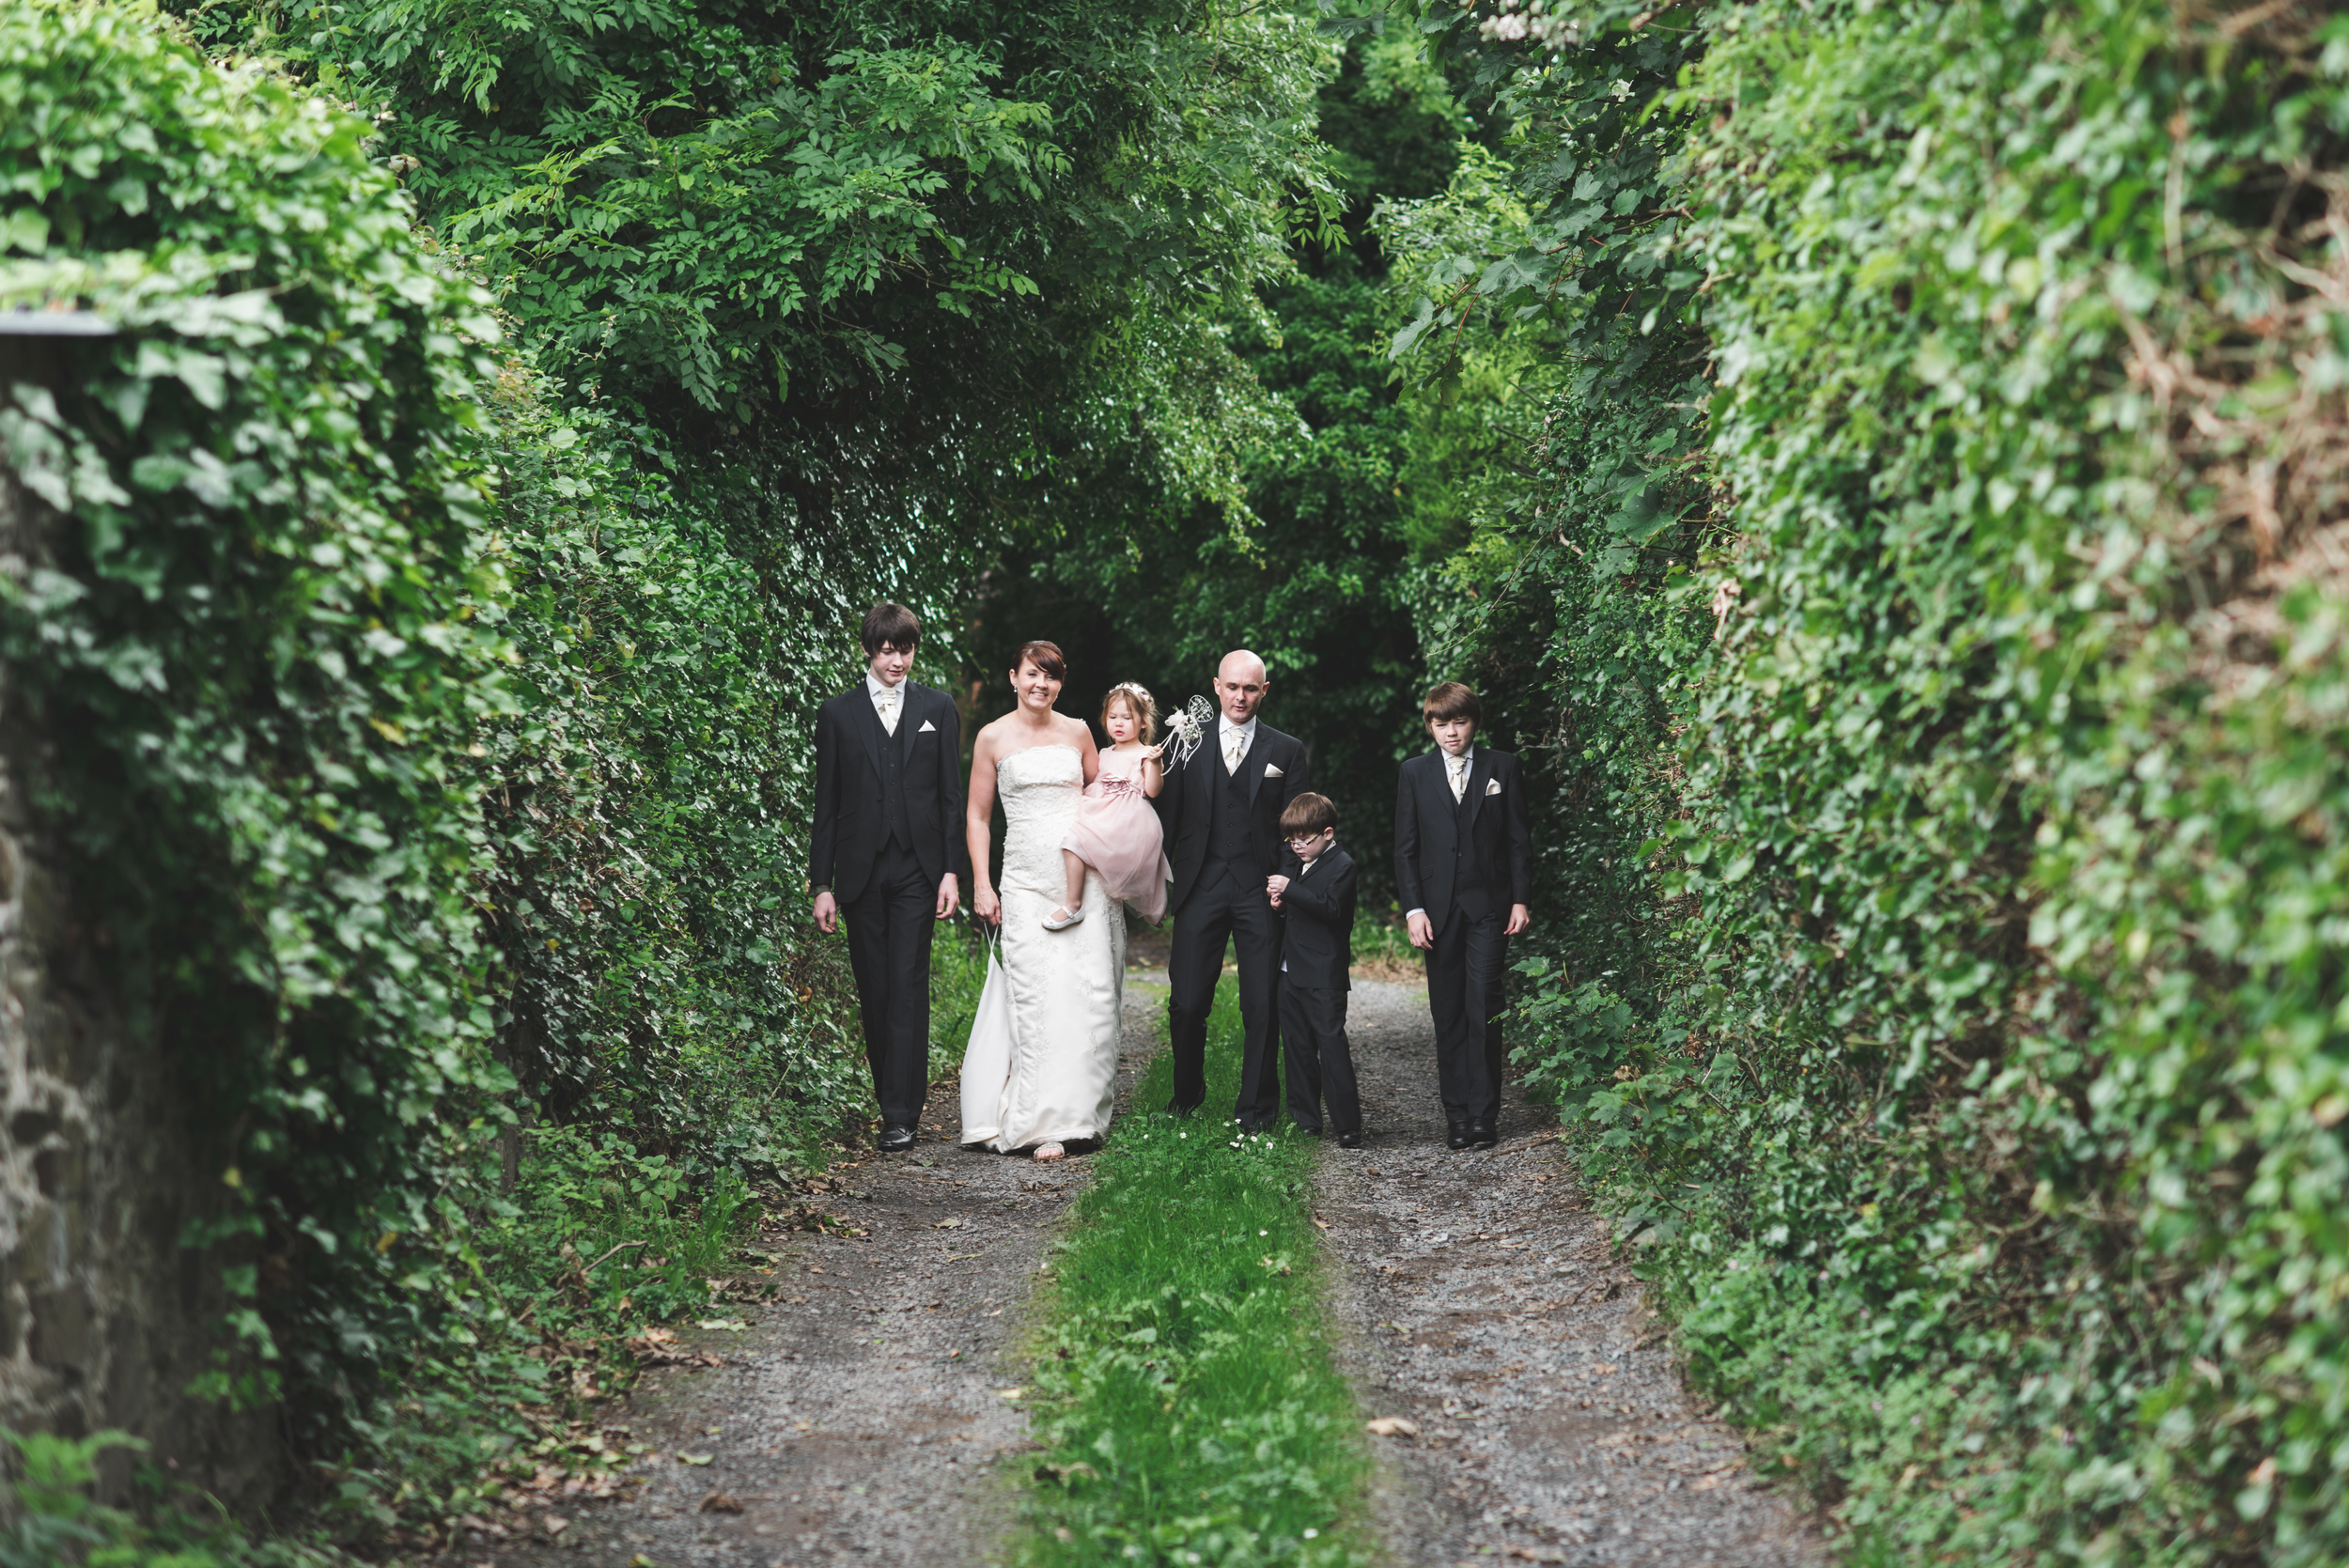 Family_Wedding_Vow_Renewal_The_Old_Inn_Crawfordsburn